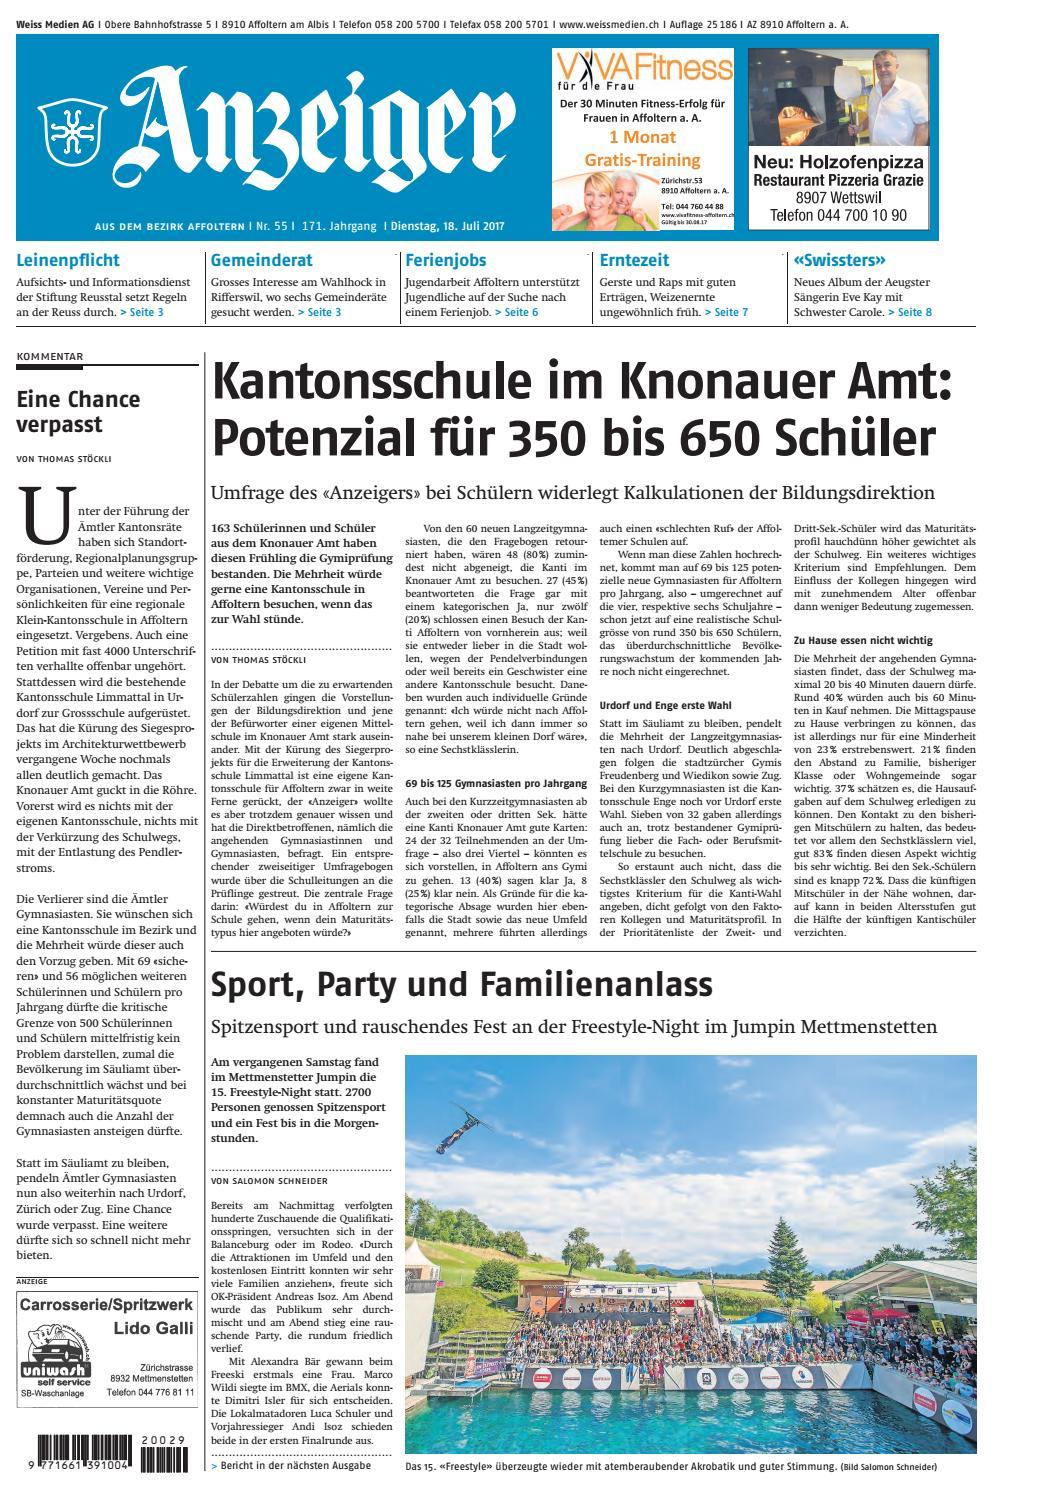 055 2017 by AZ-Anzeiger - issuu